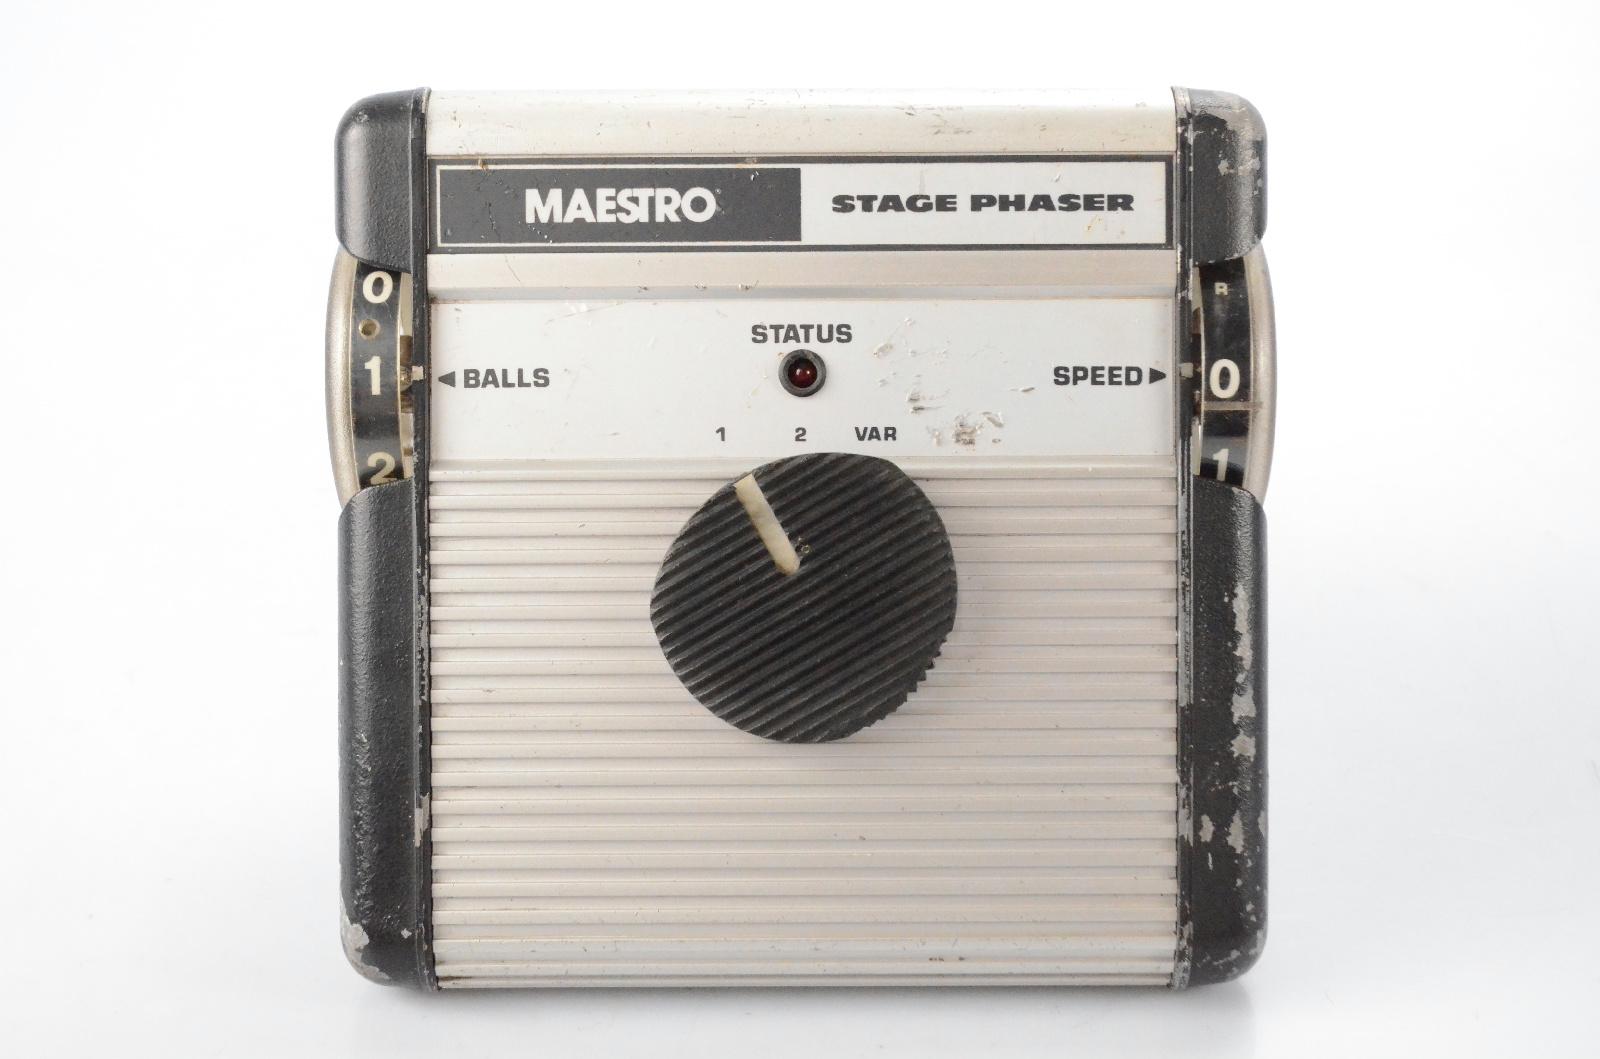 Maestro MSP Stage Phaser Pedal Vintage Rare #32417